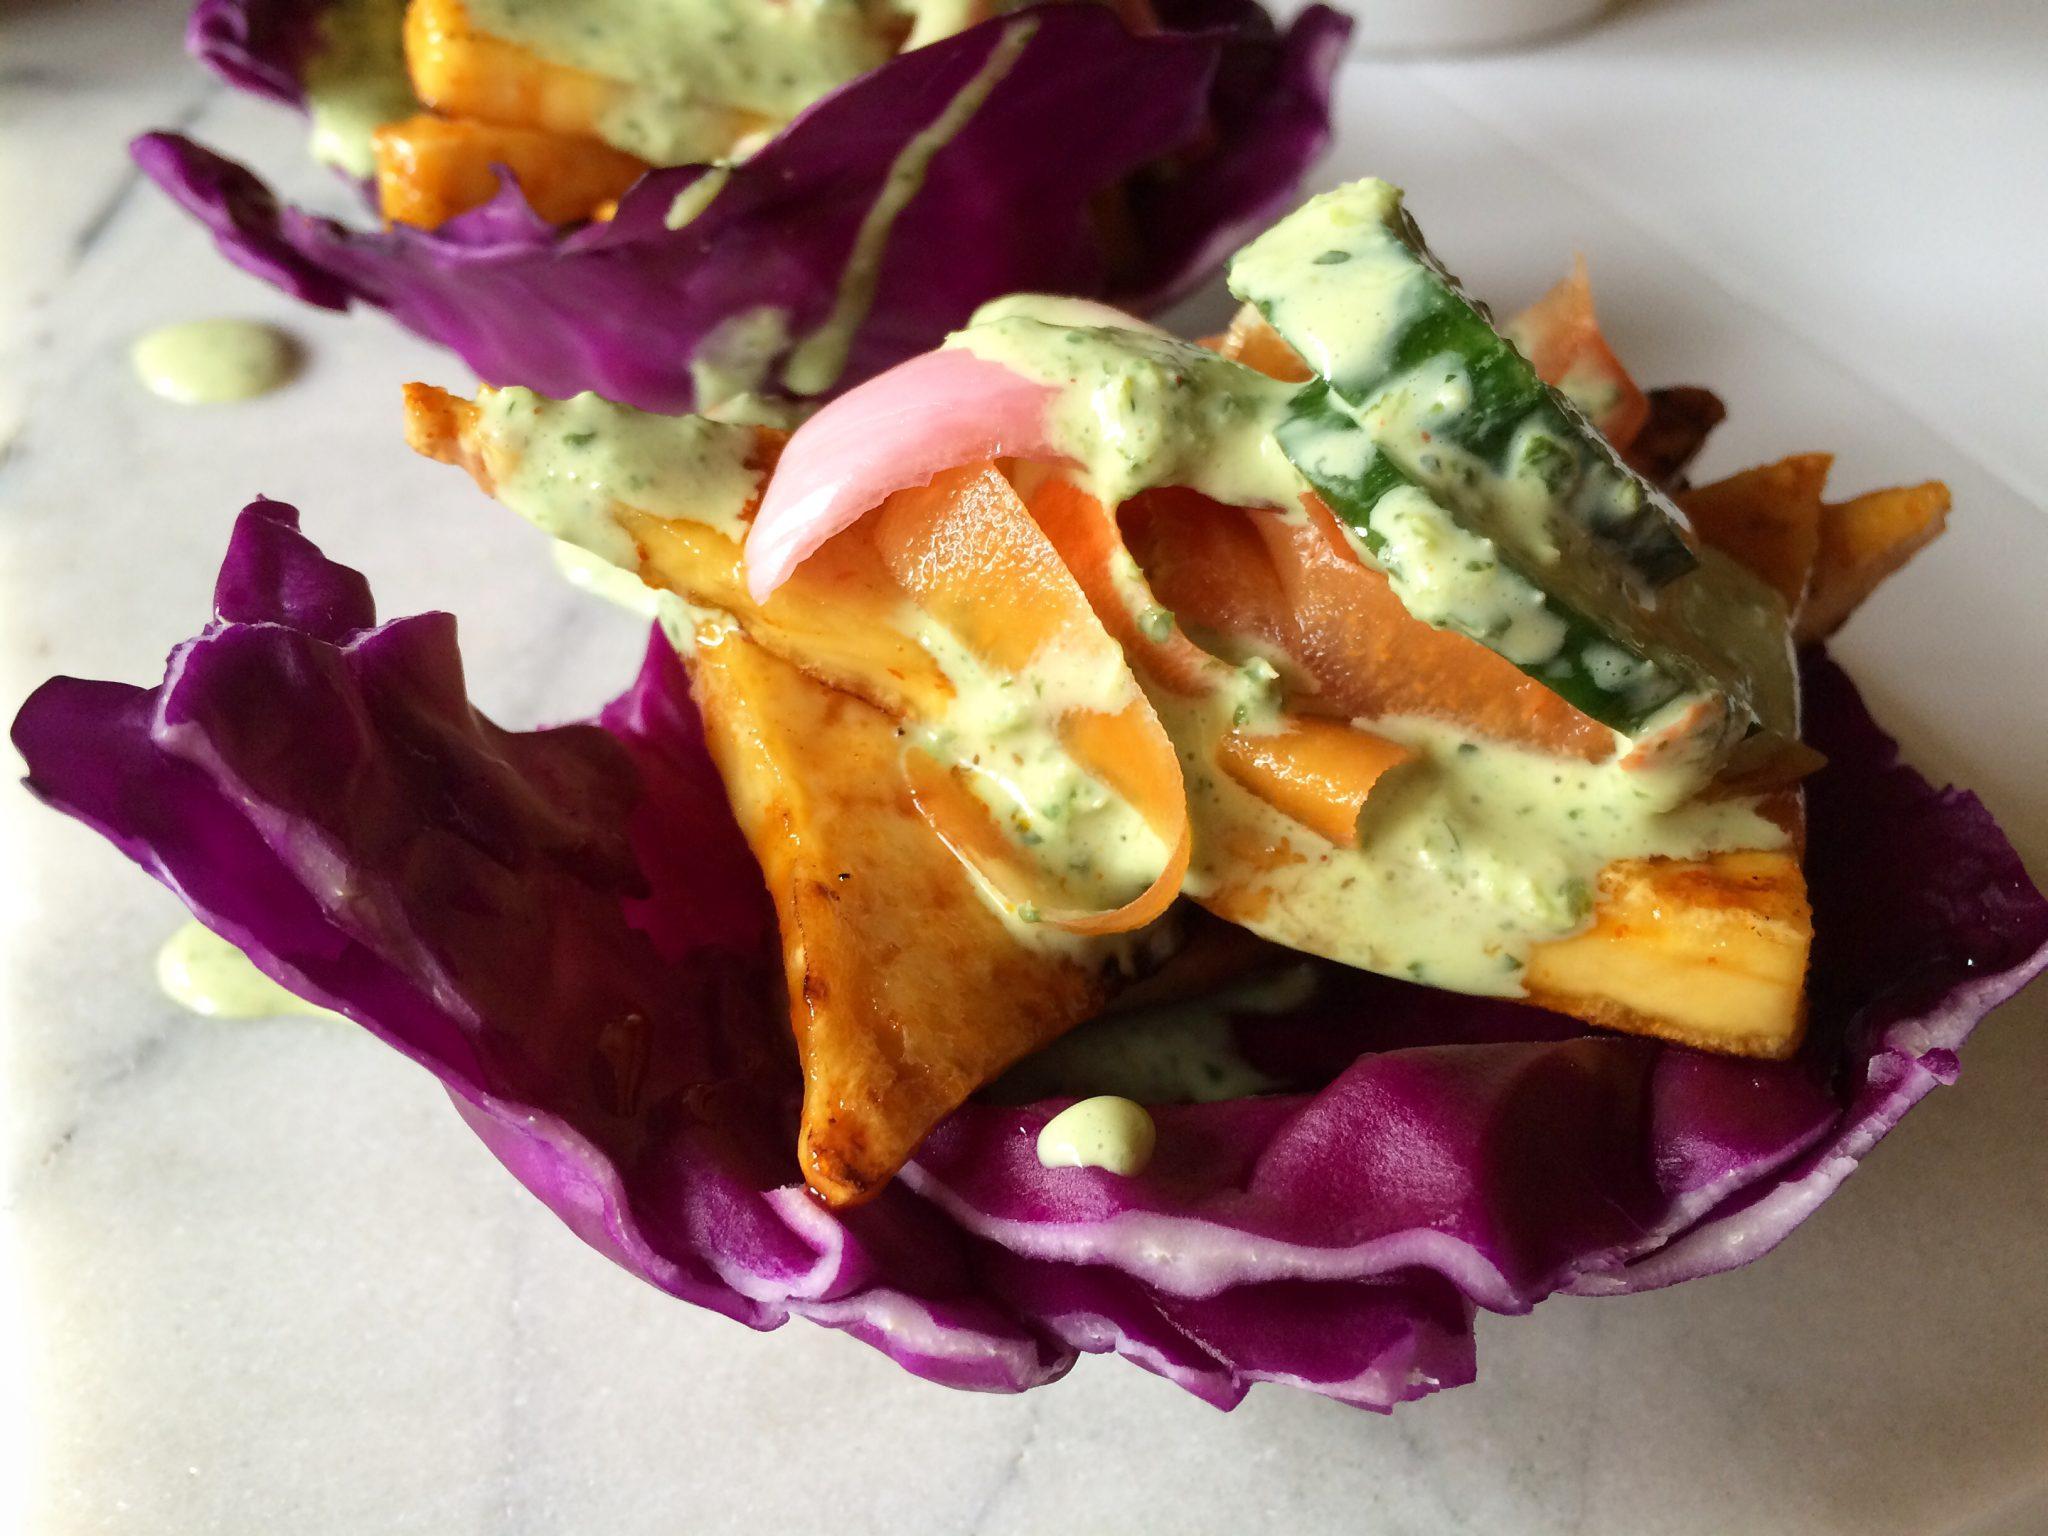 Foodie Friday: Vibrant Bánh mì Tacos